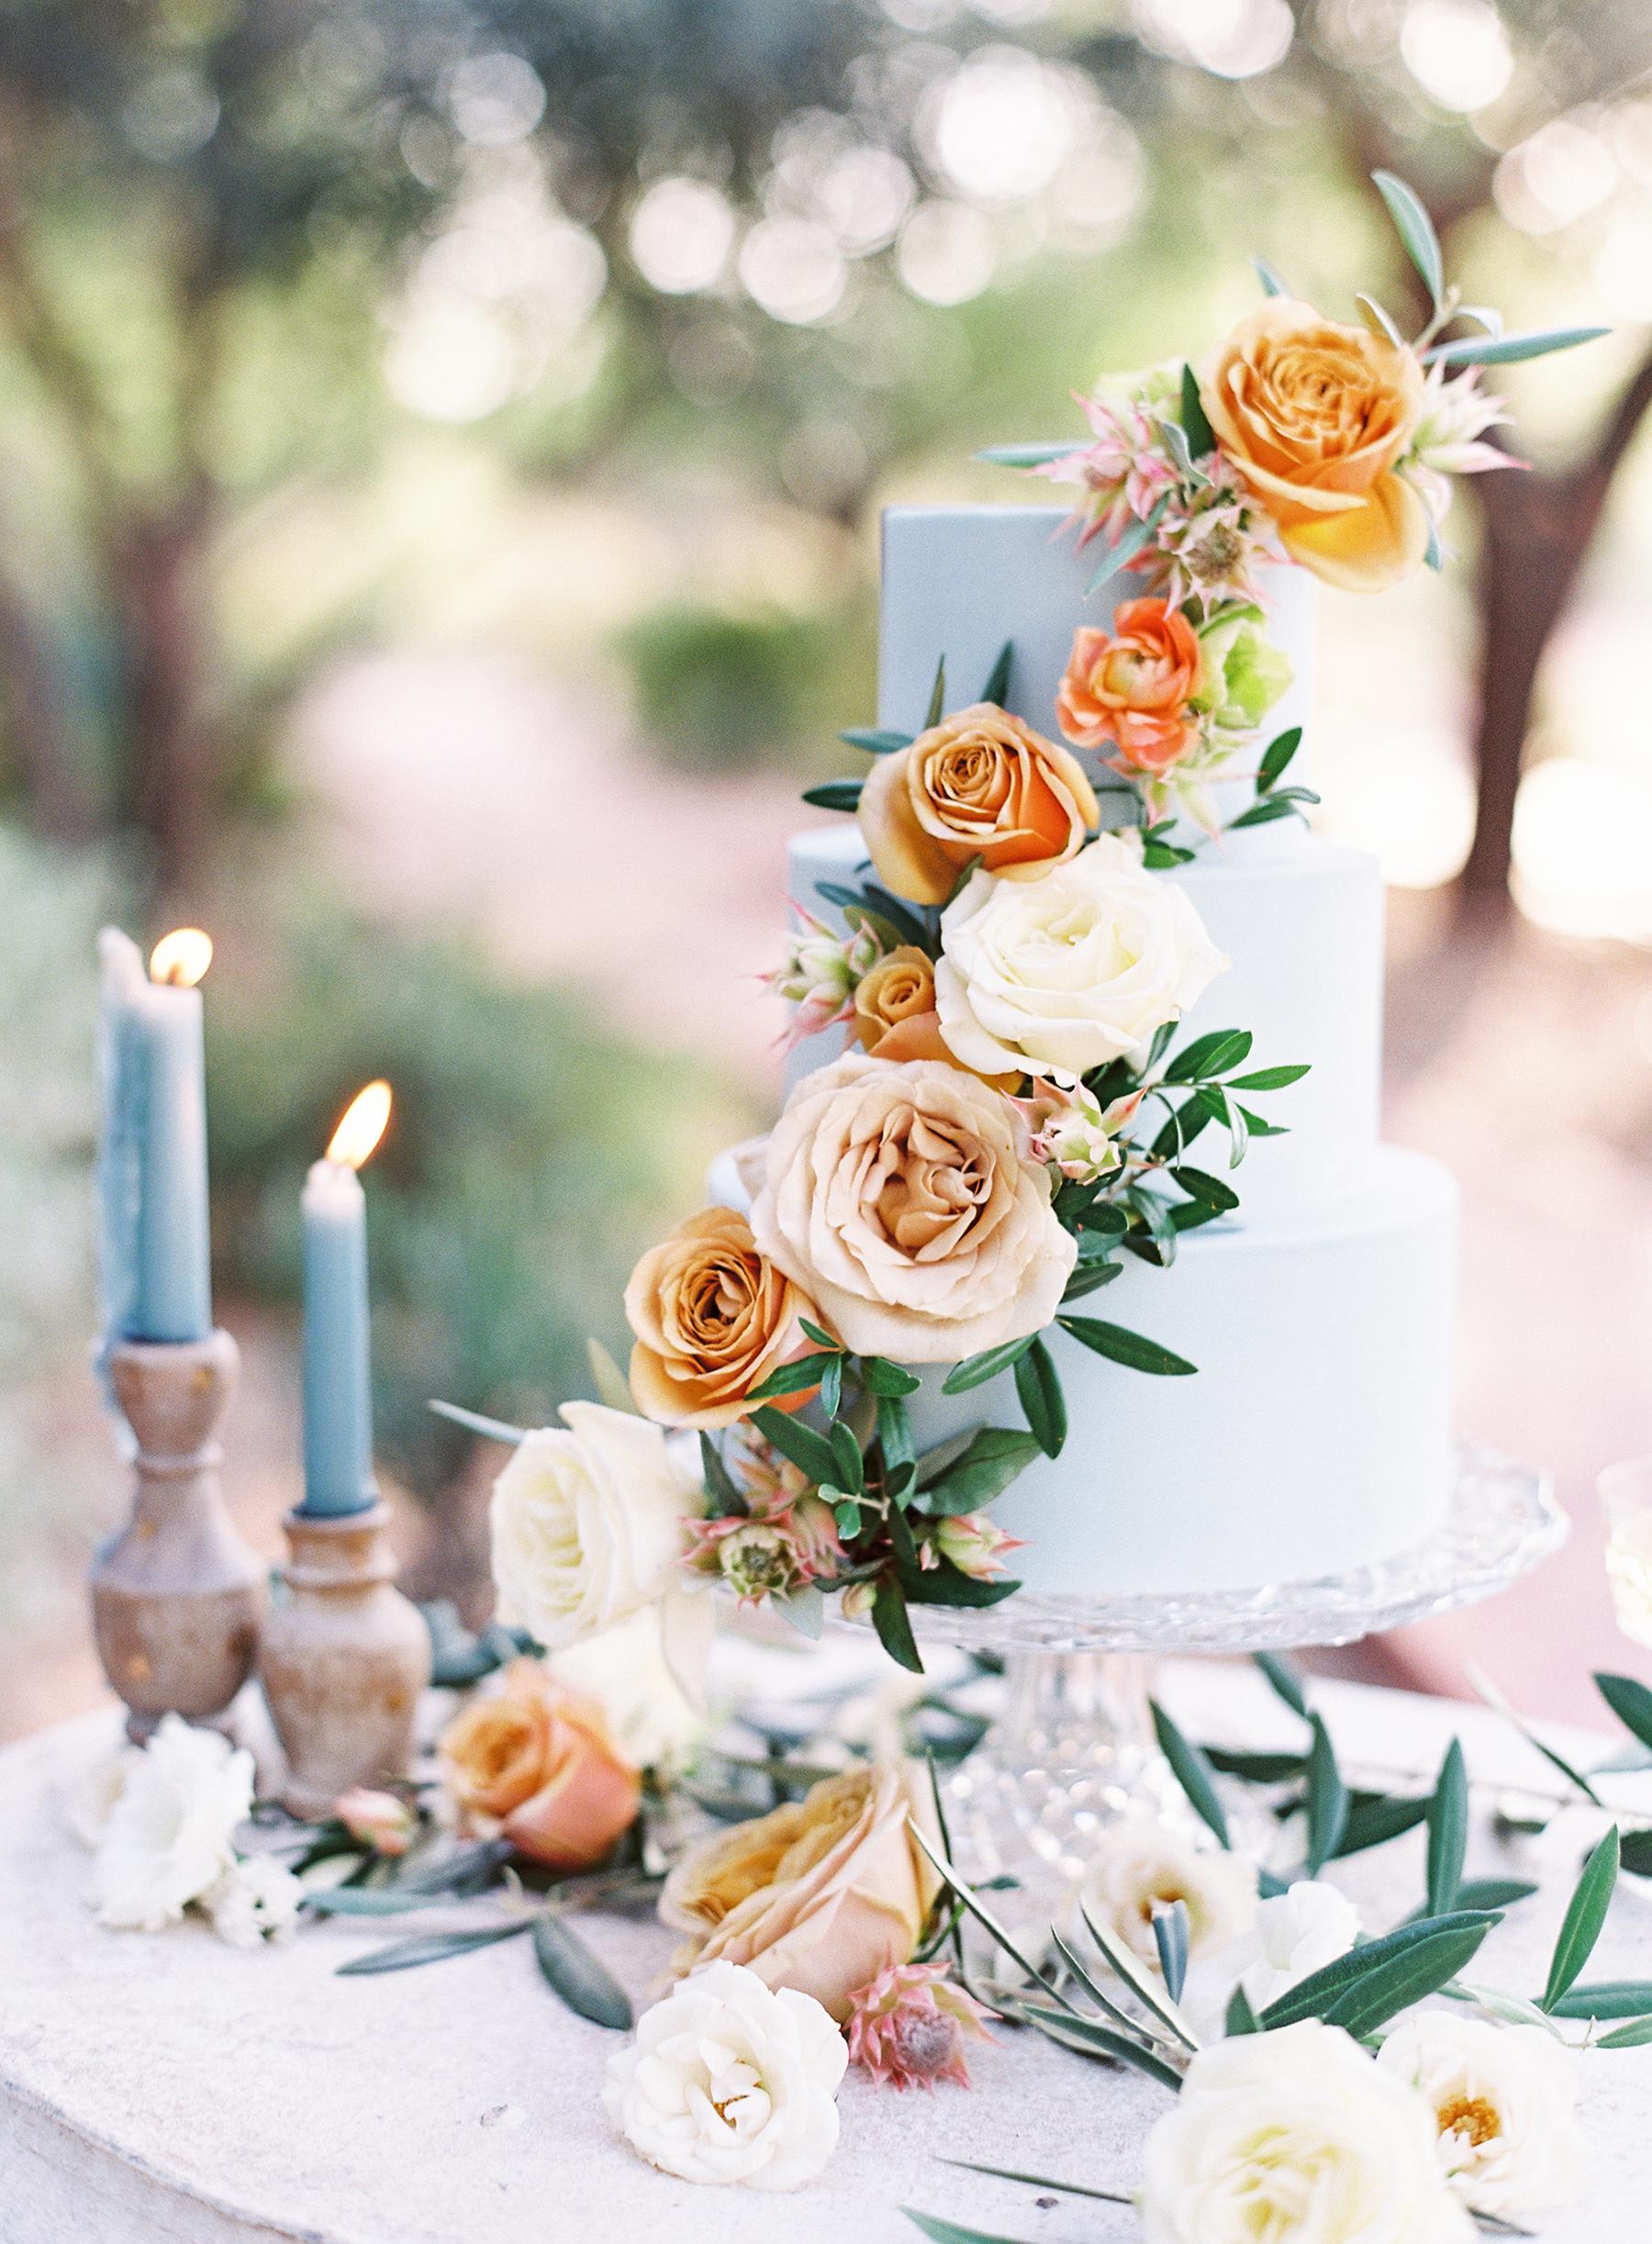 light blue wedding cake with orange flowers